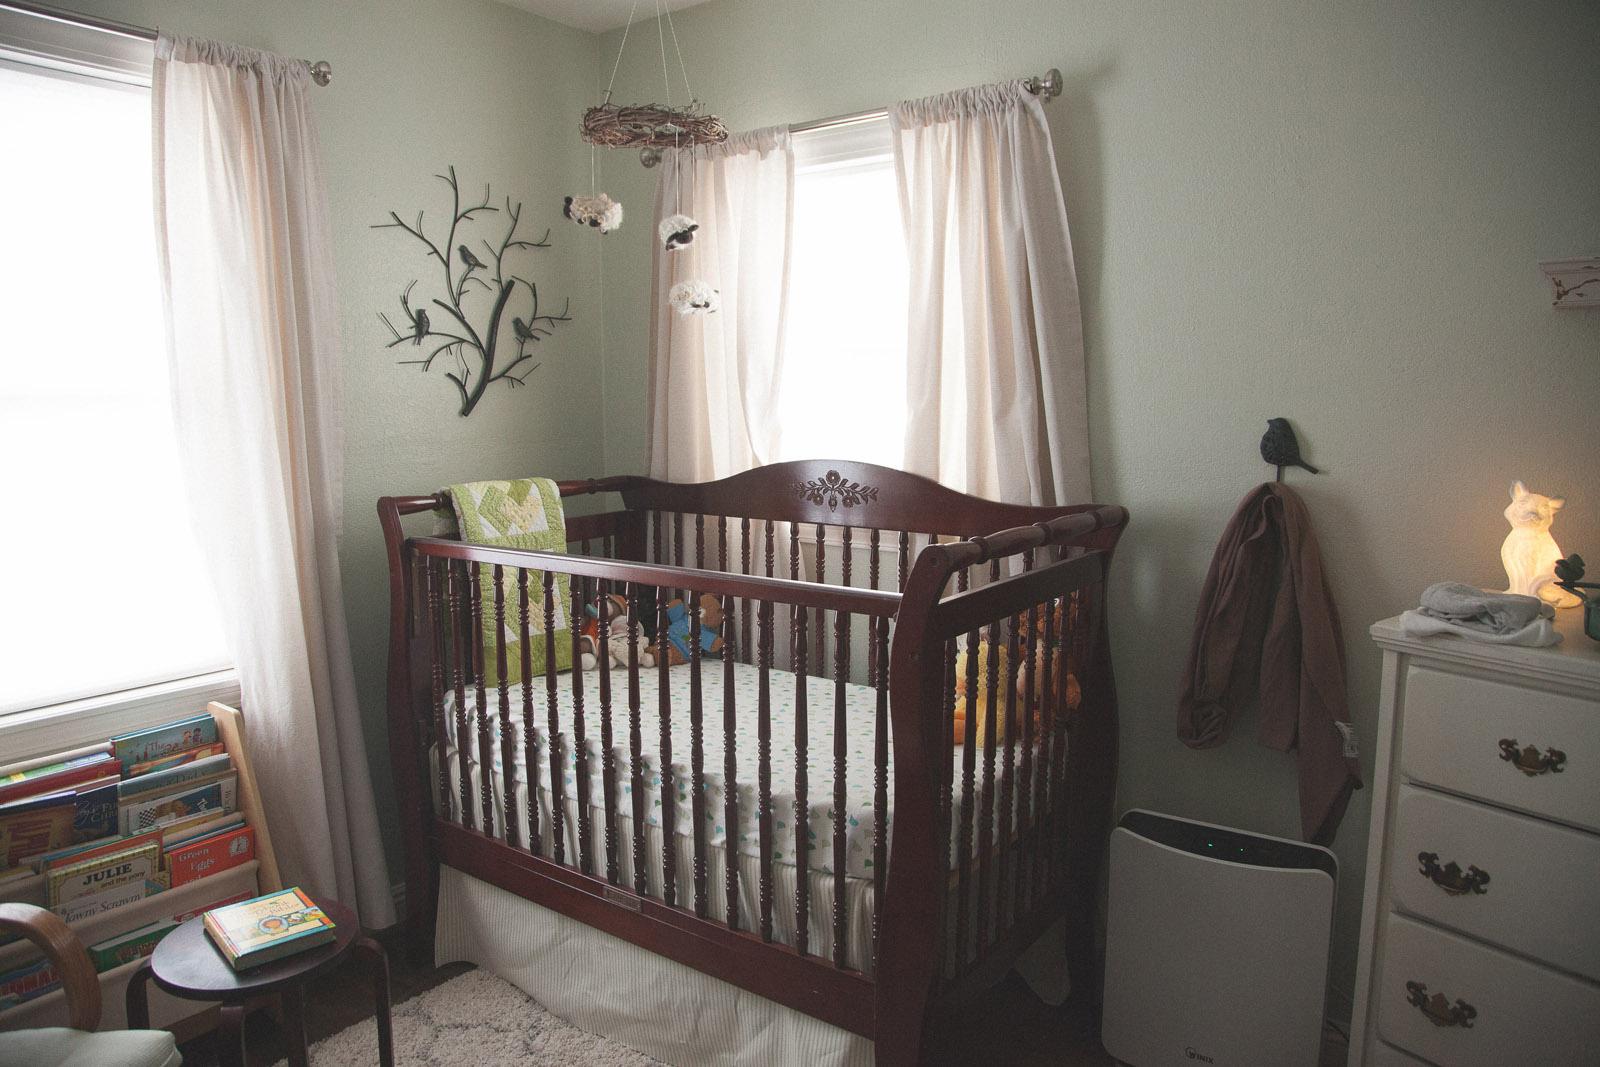 003-nursery-baby-birds-woodland-new-mexico-farmington